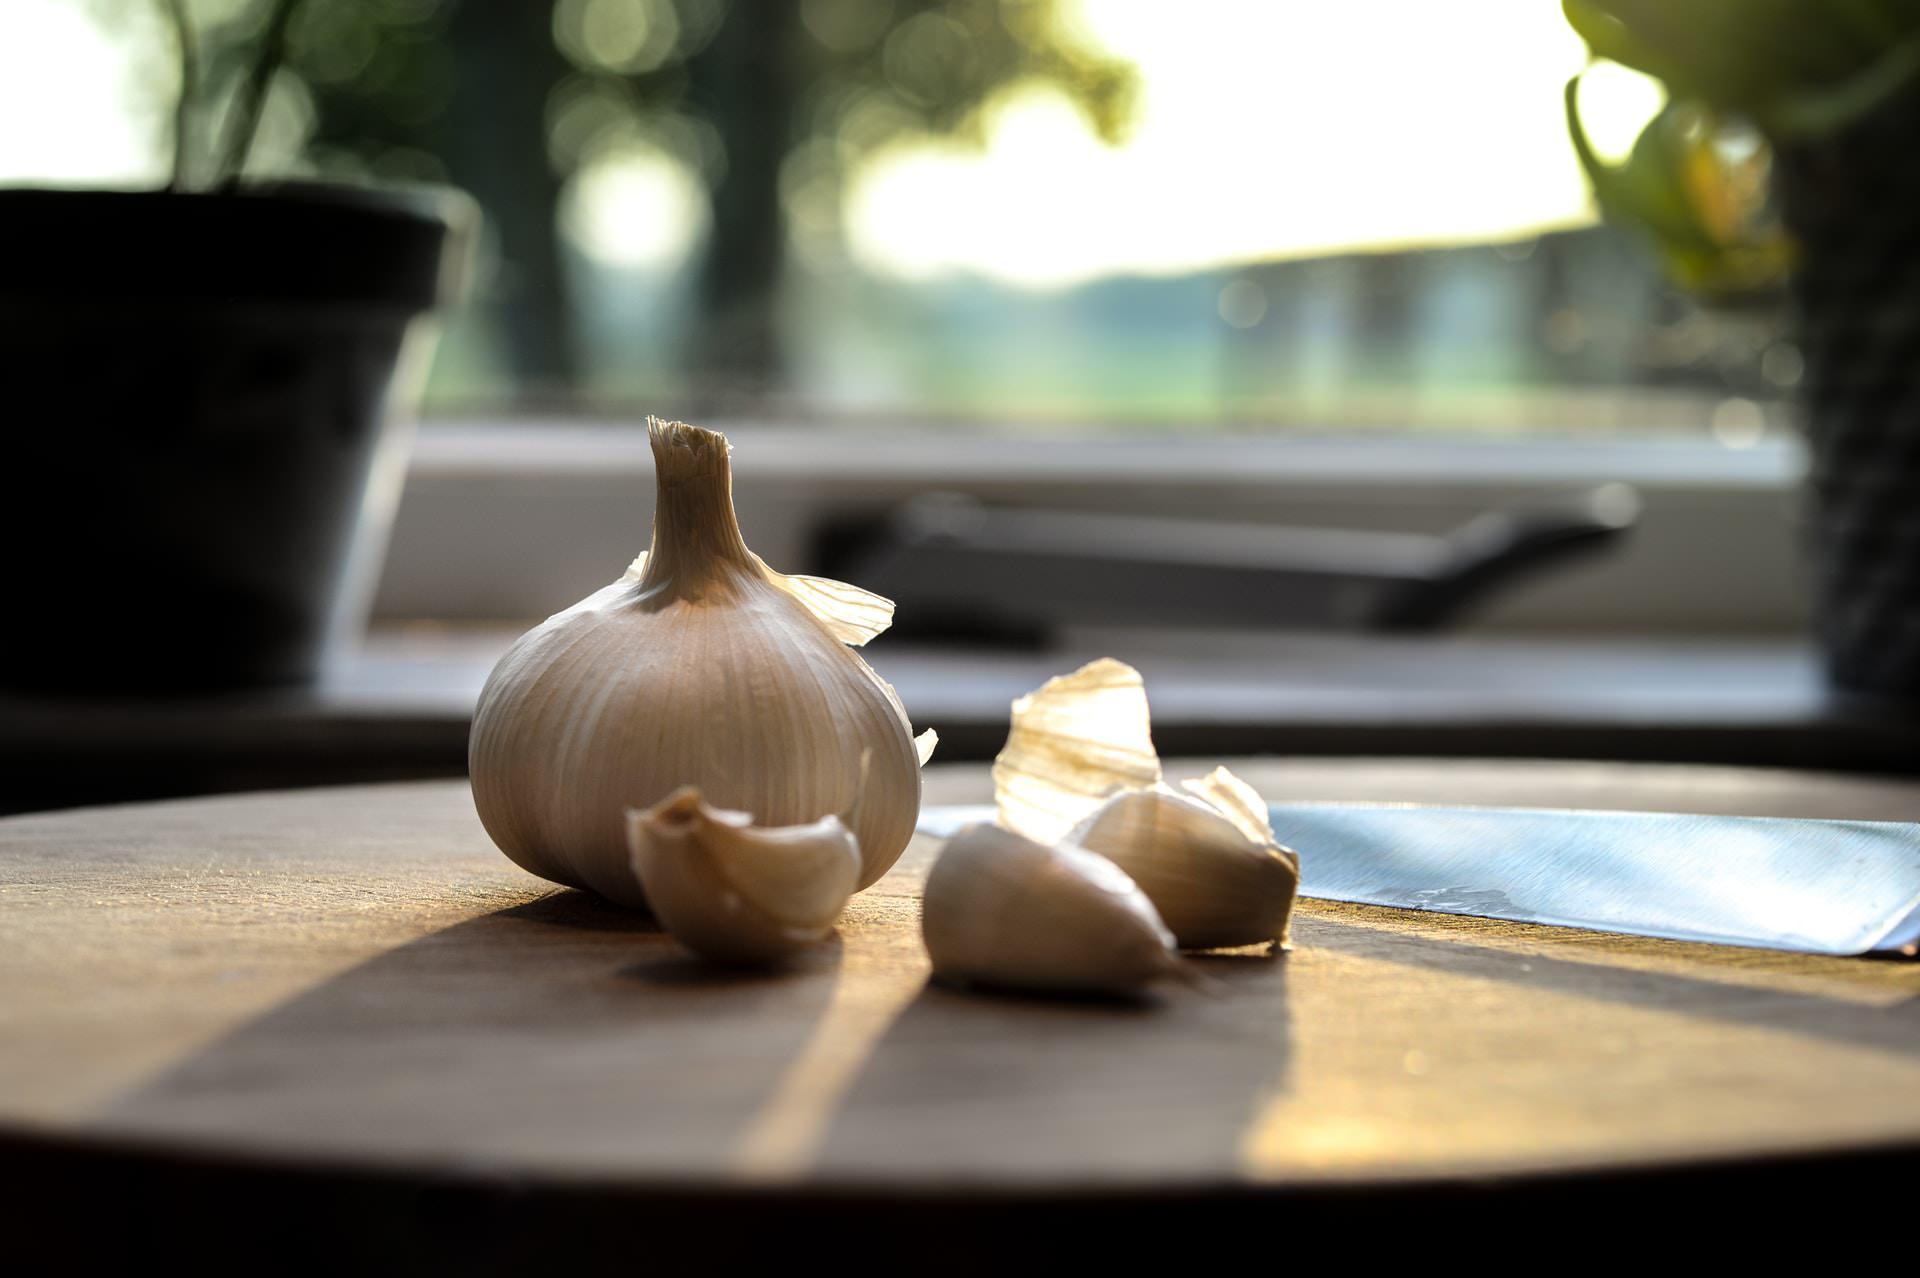 garlic kitchen peeled blub healthy stock